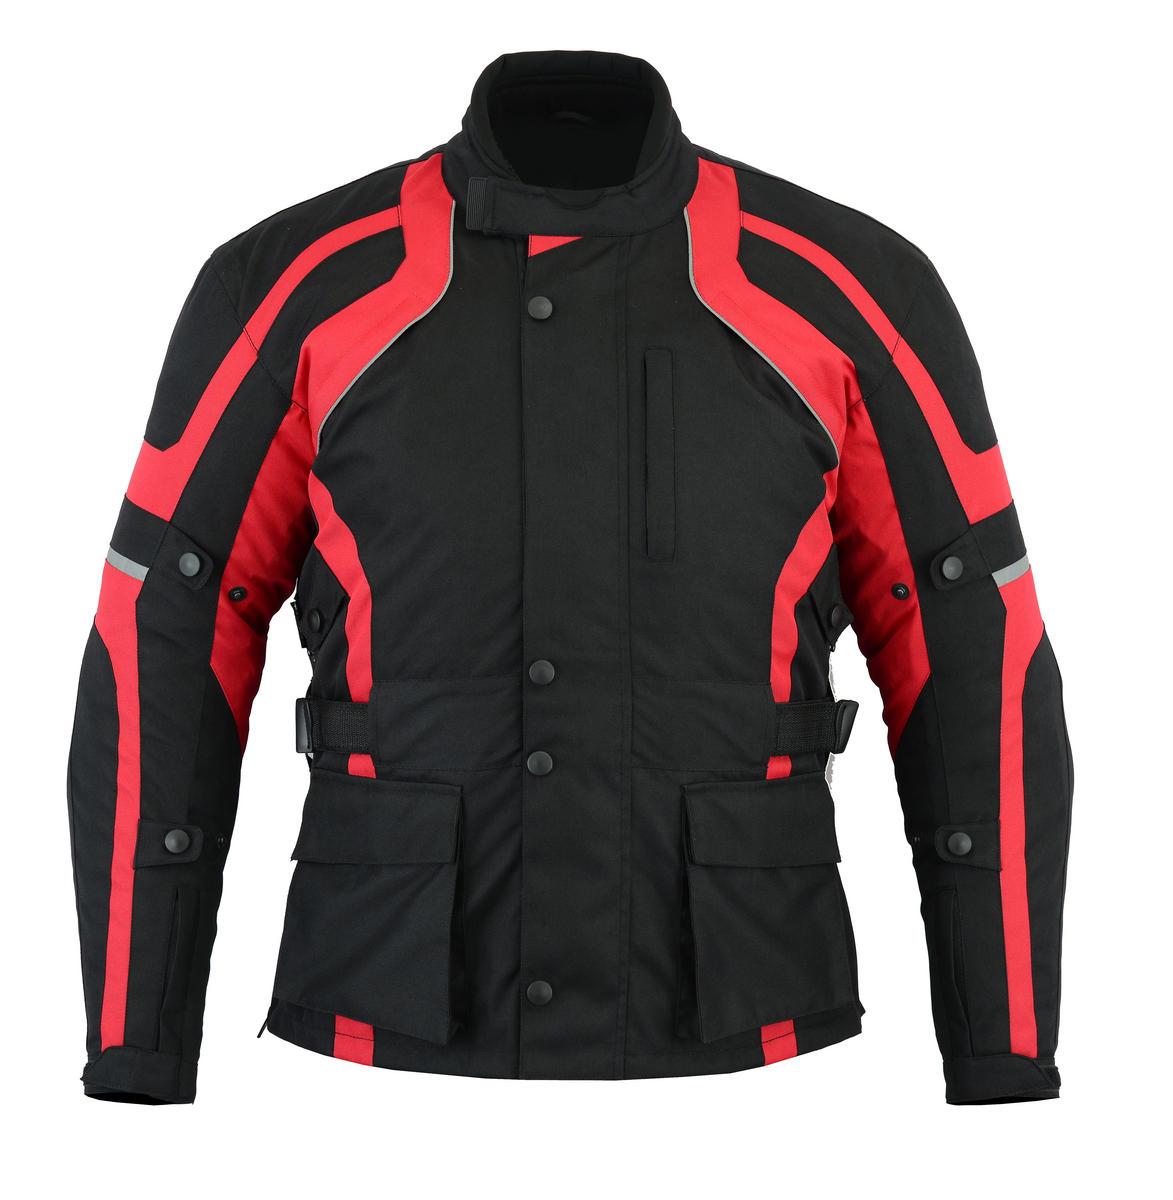 Texpeed Black & Red Cordura Jacket